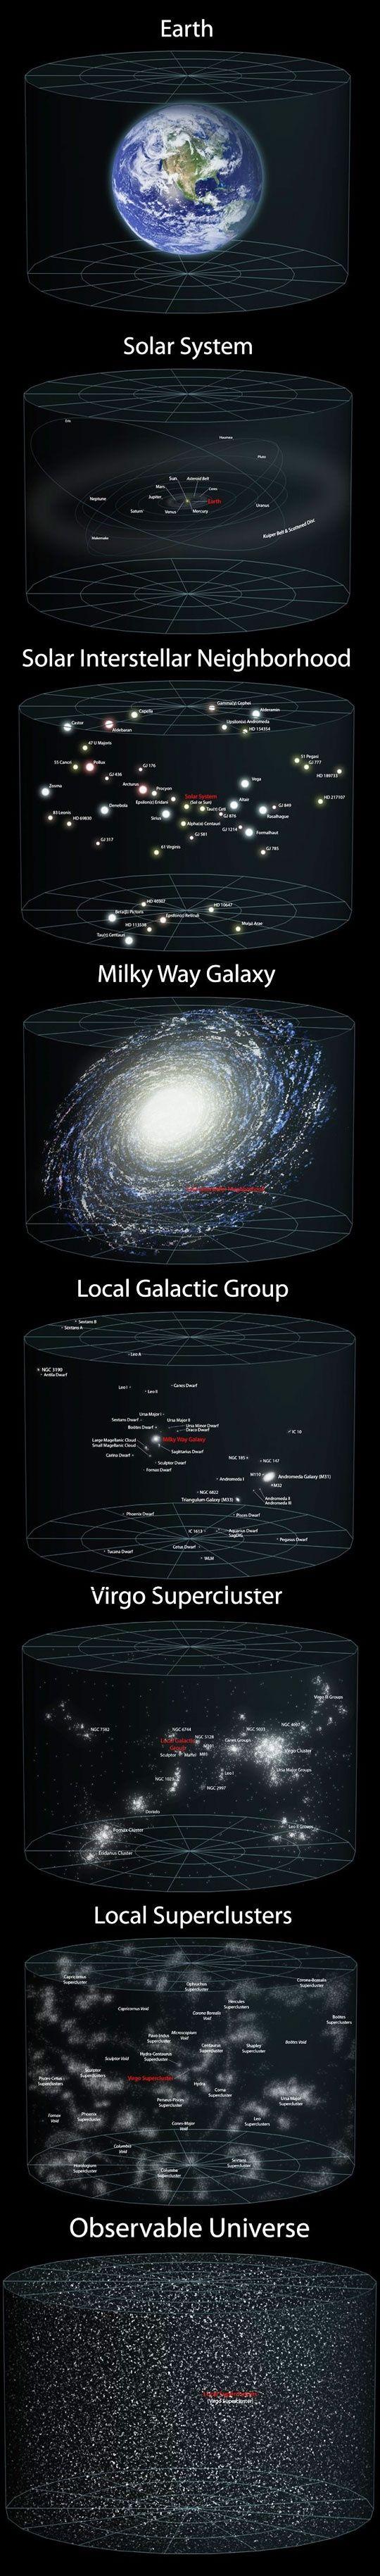 Escala gráfica del universo.